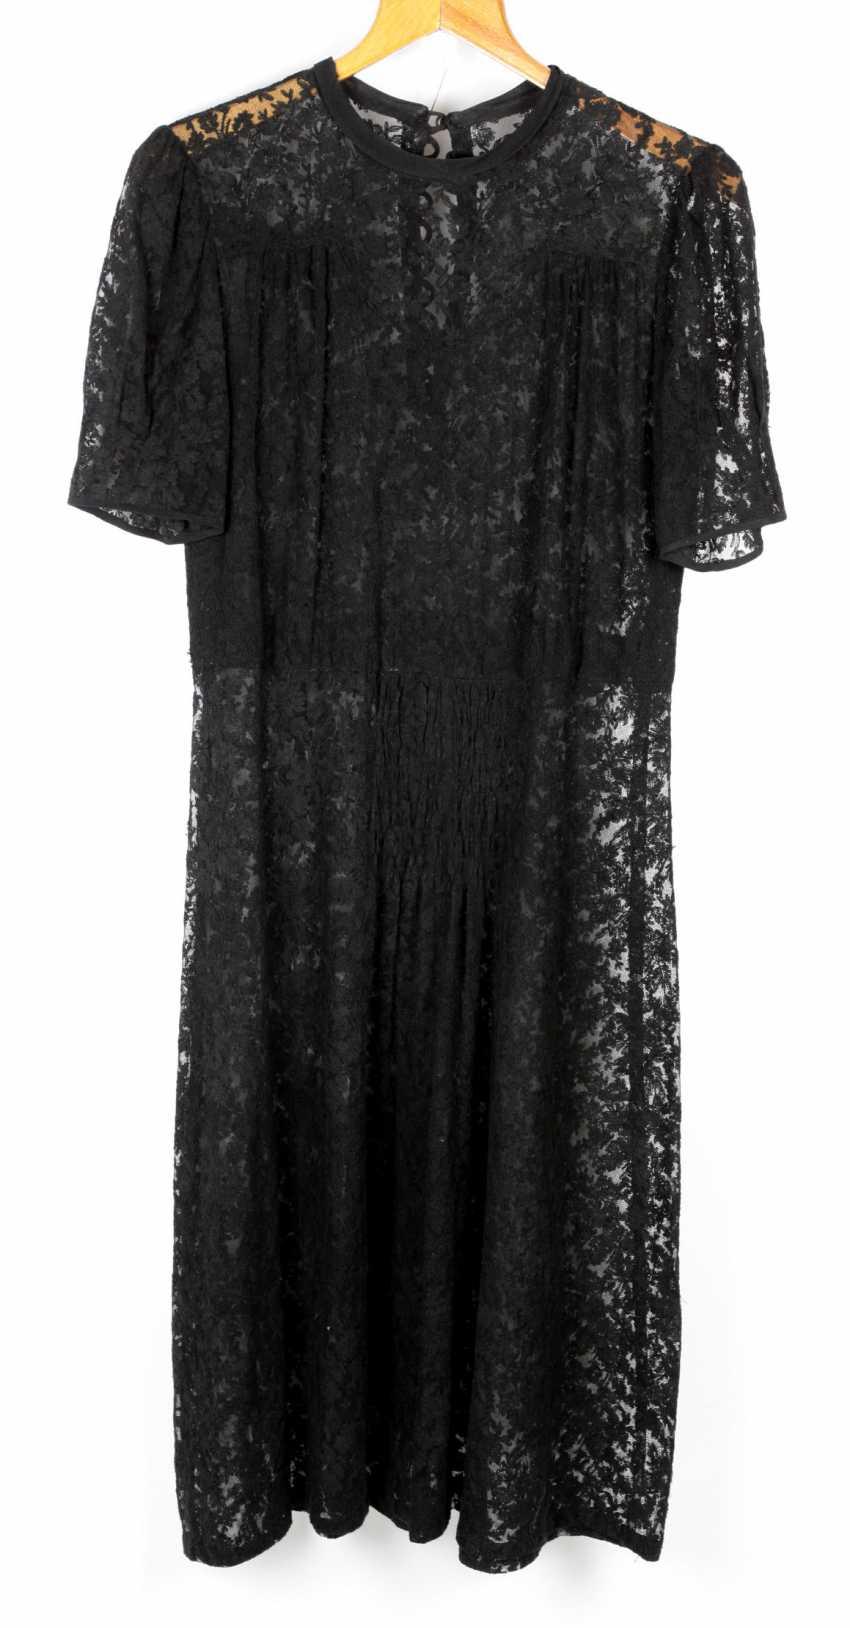 black lace dress 1920 - photo 1